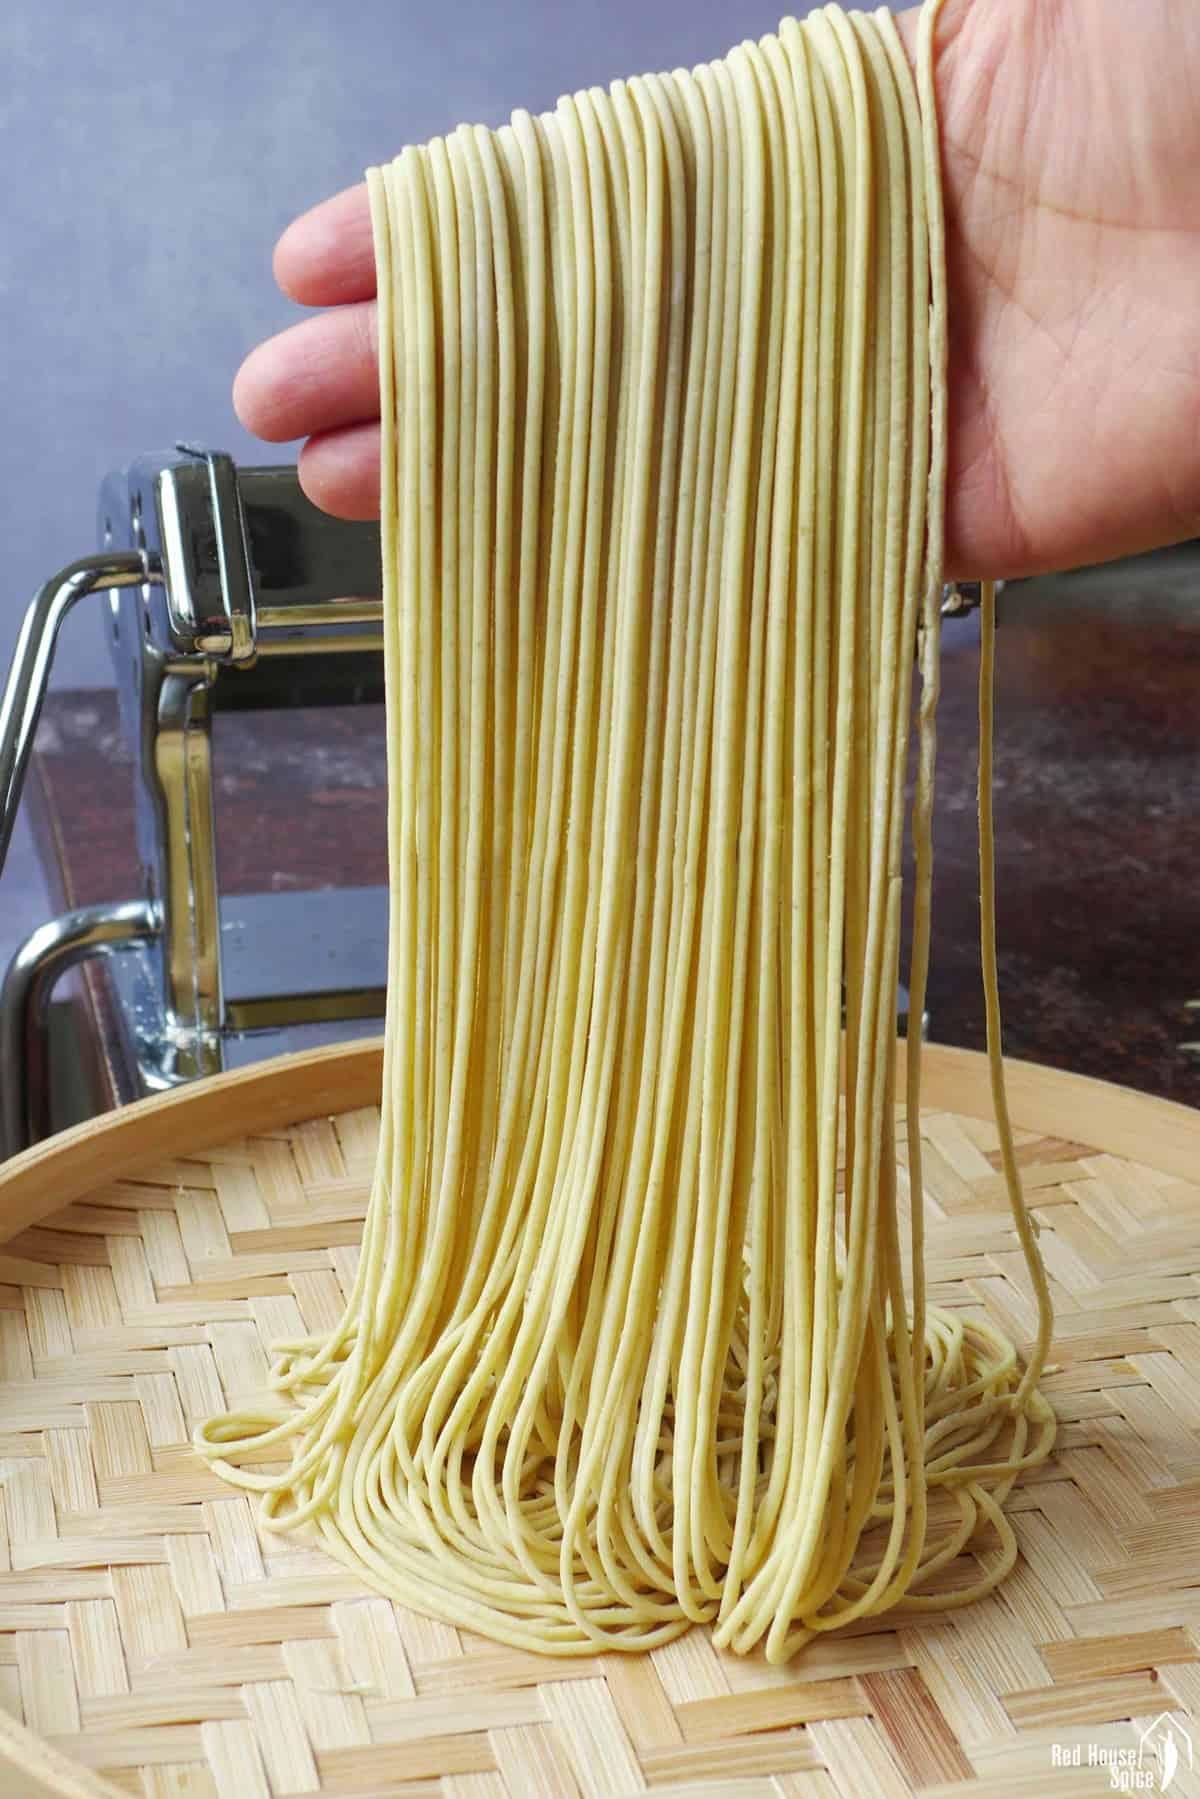 a hand holding fresh alkaline noodles